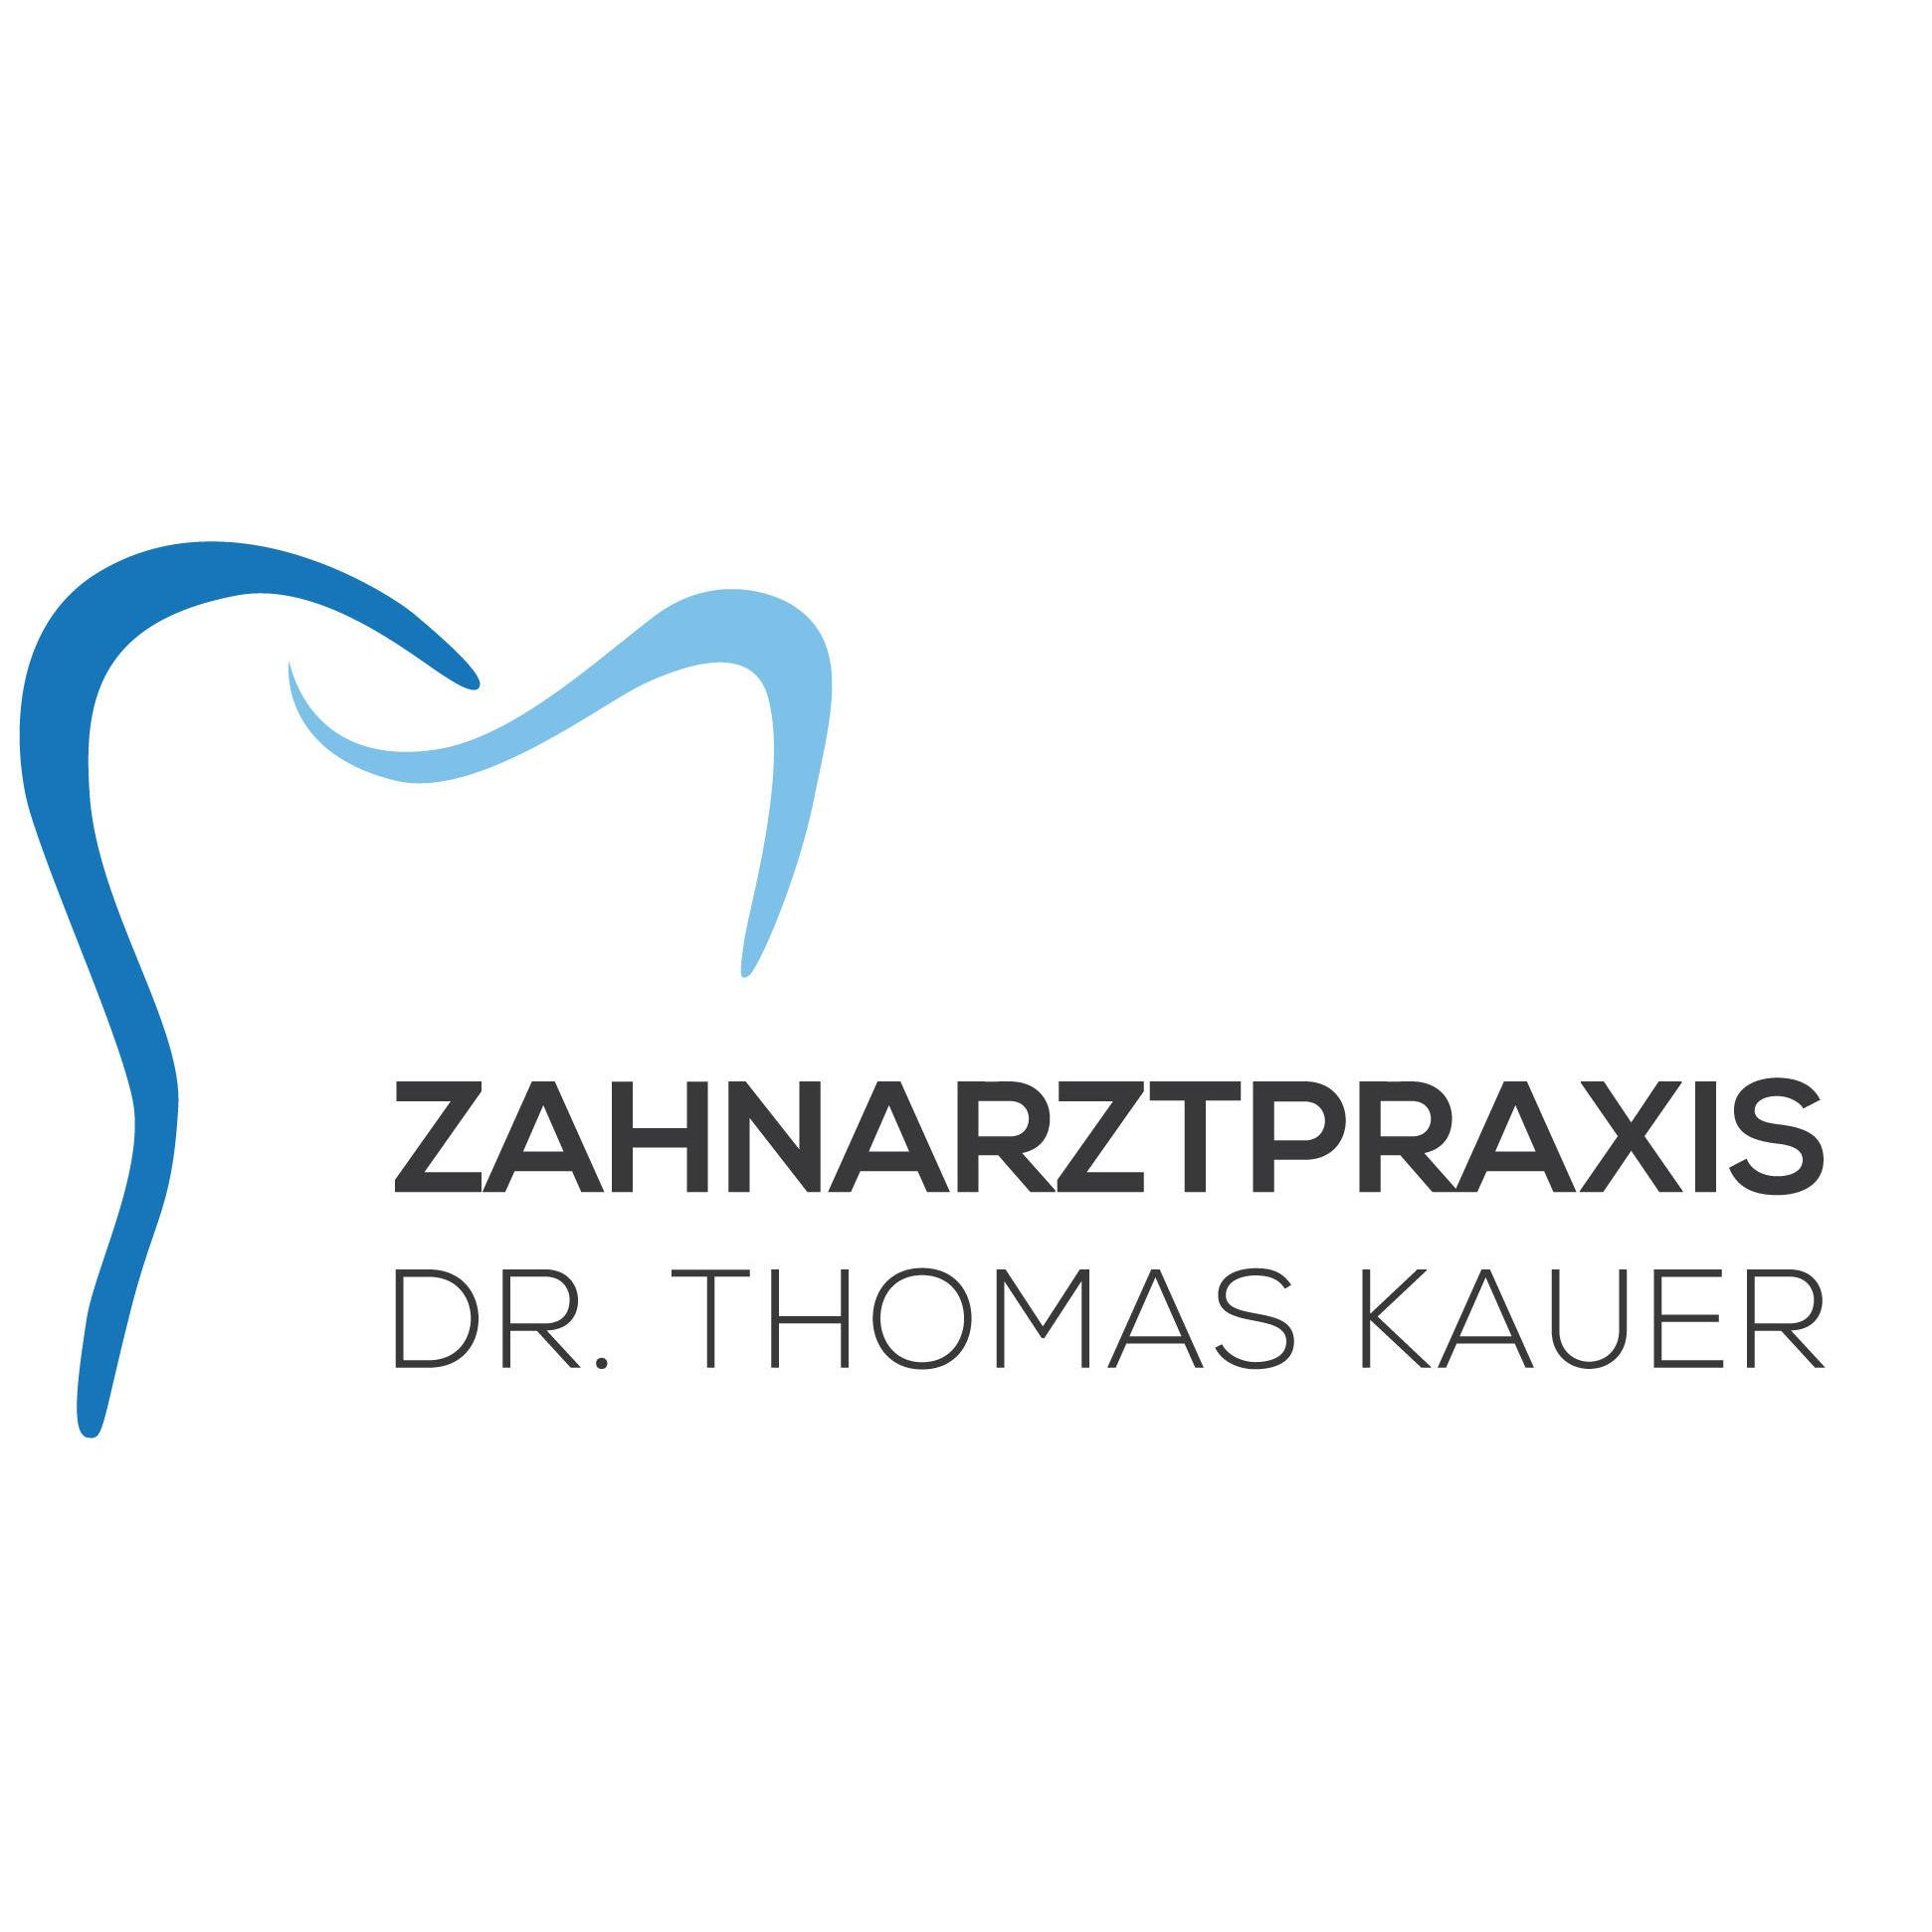 Zahnarzt Dr. Thomas Kauer Regau Vital